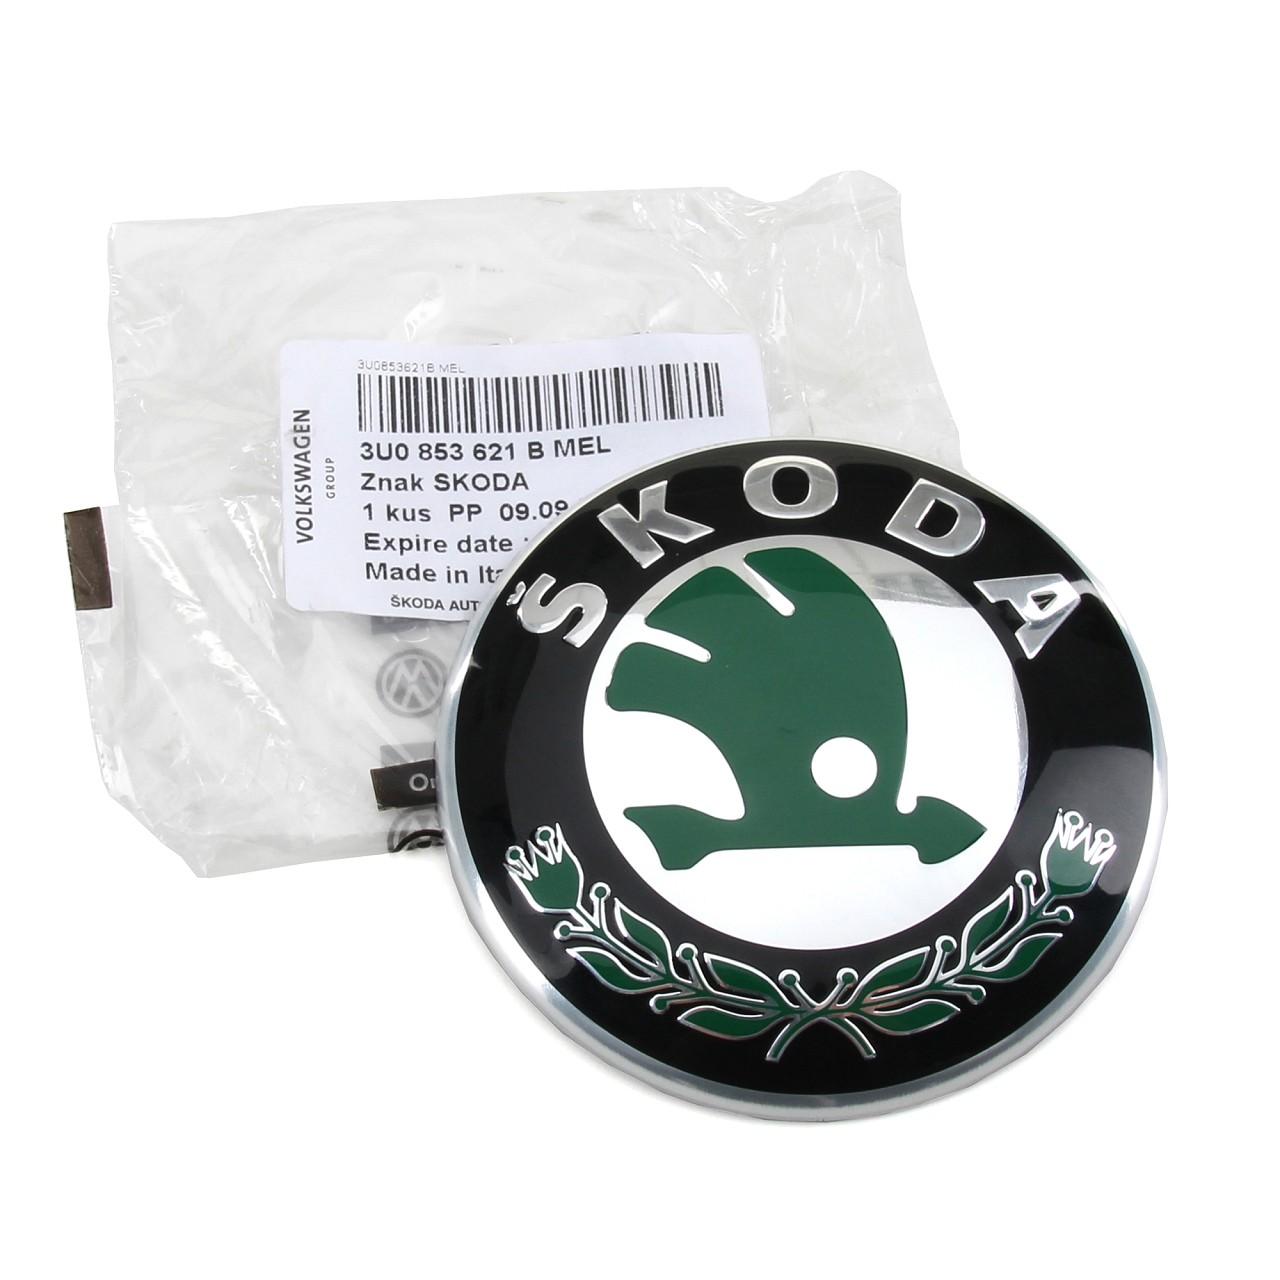 ORIGINAL Skoda Emblem FABIA 2 3 OCTAVIA 1 2 RAPID SUPERB 1 vorne 3U0853621B MEL